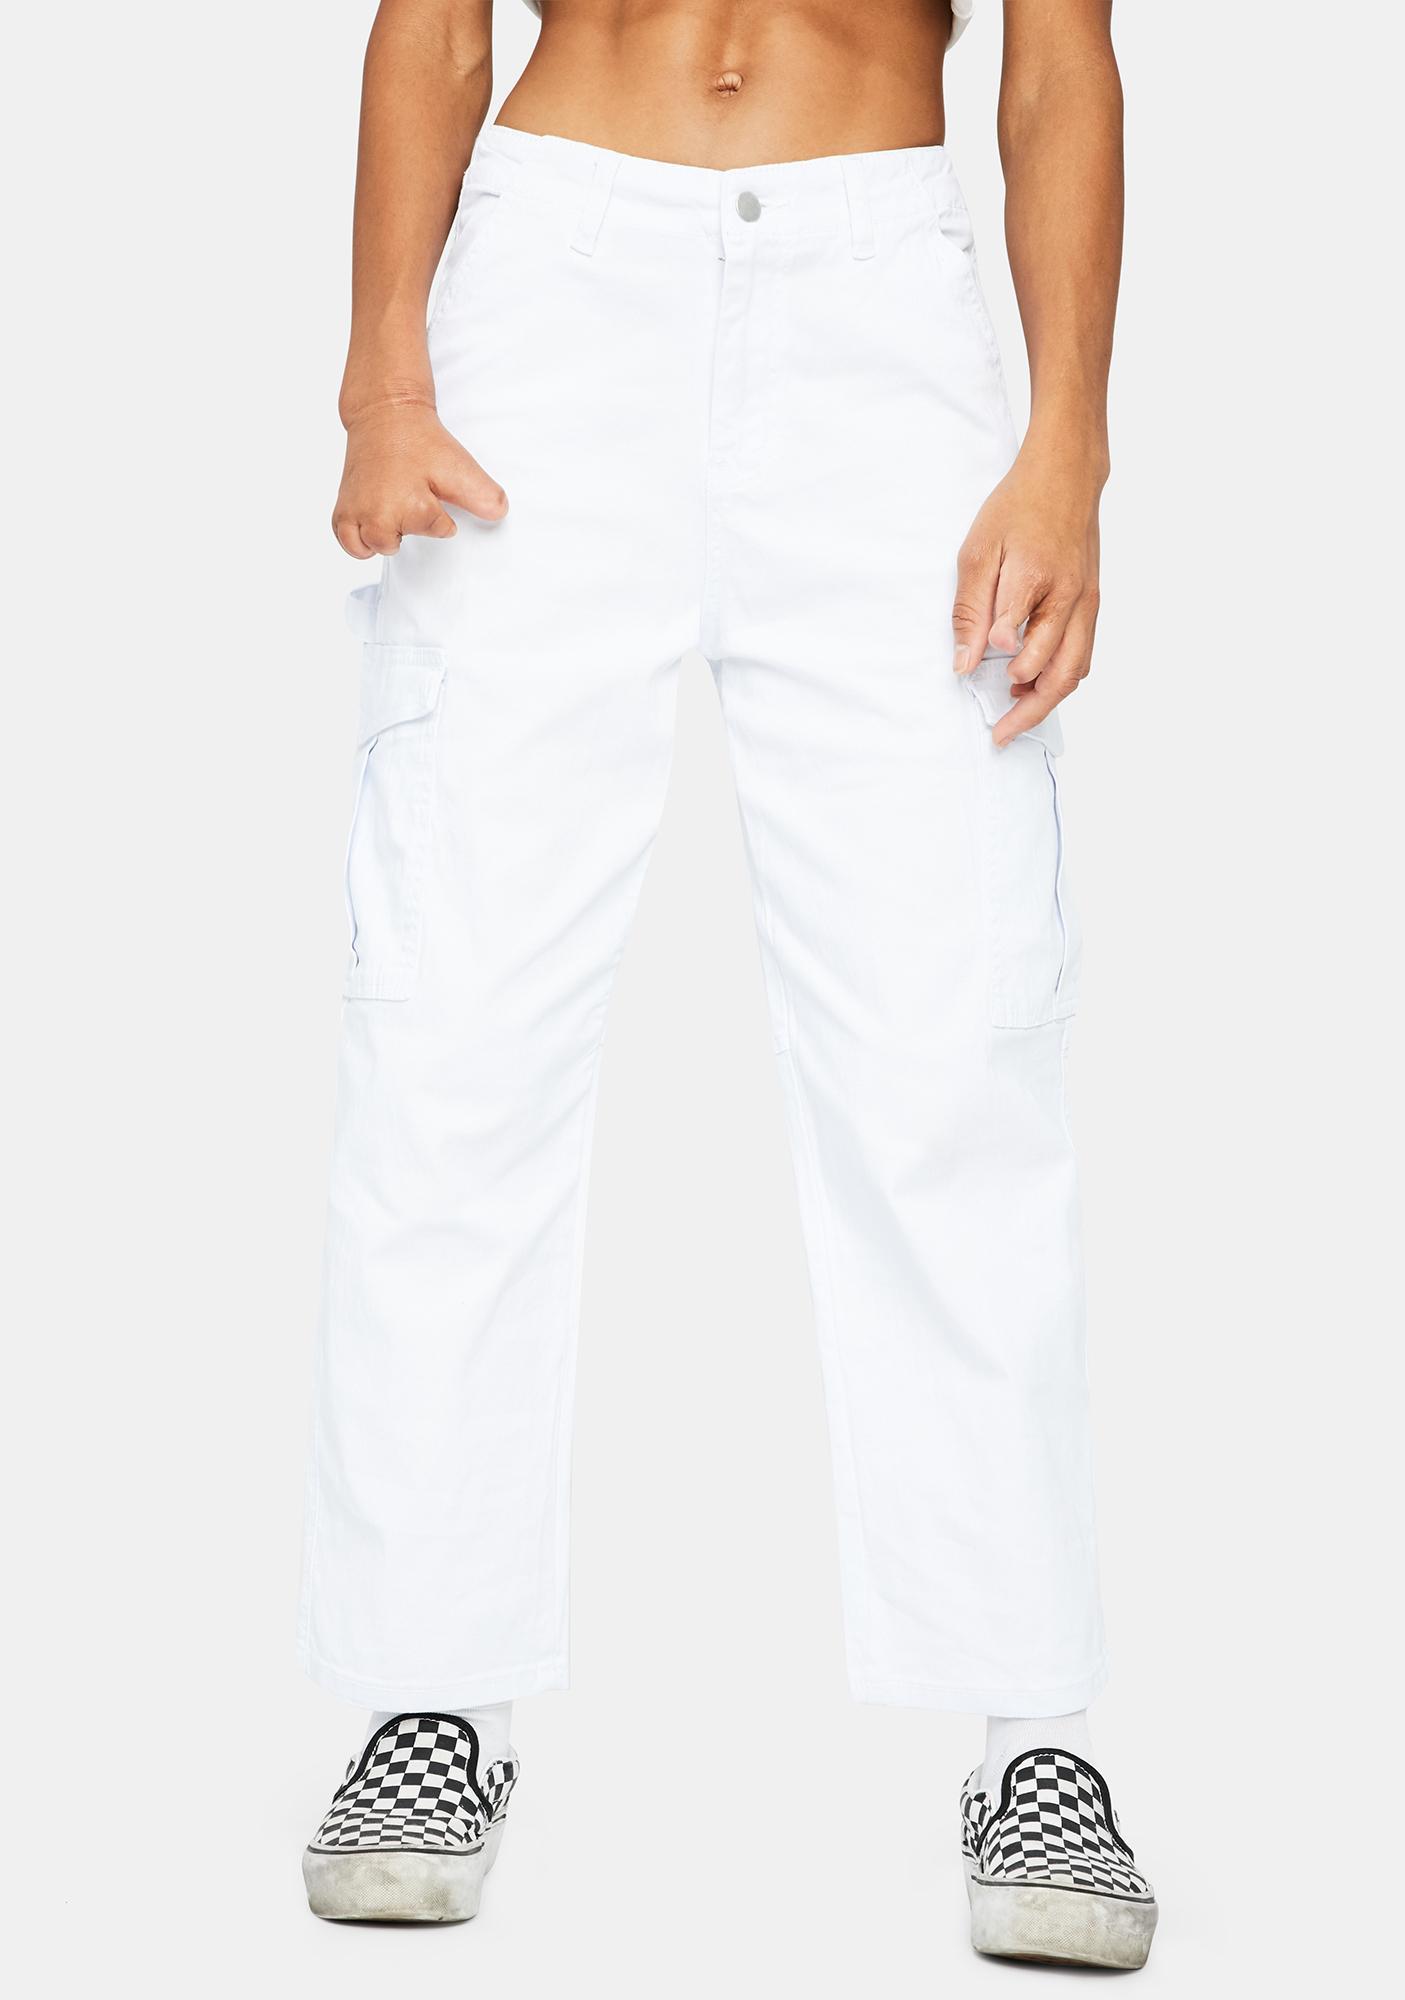 Undercover Dream Cargo Pants